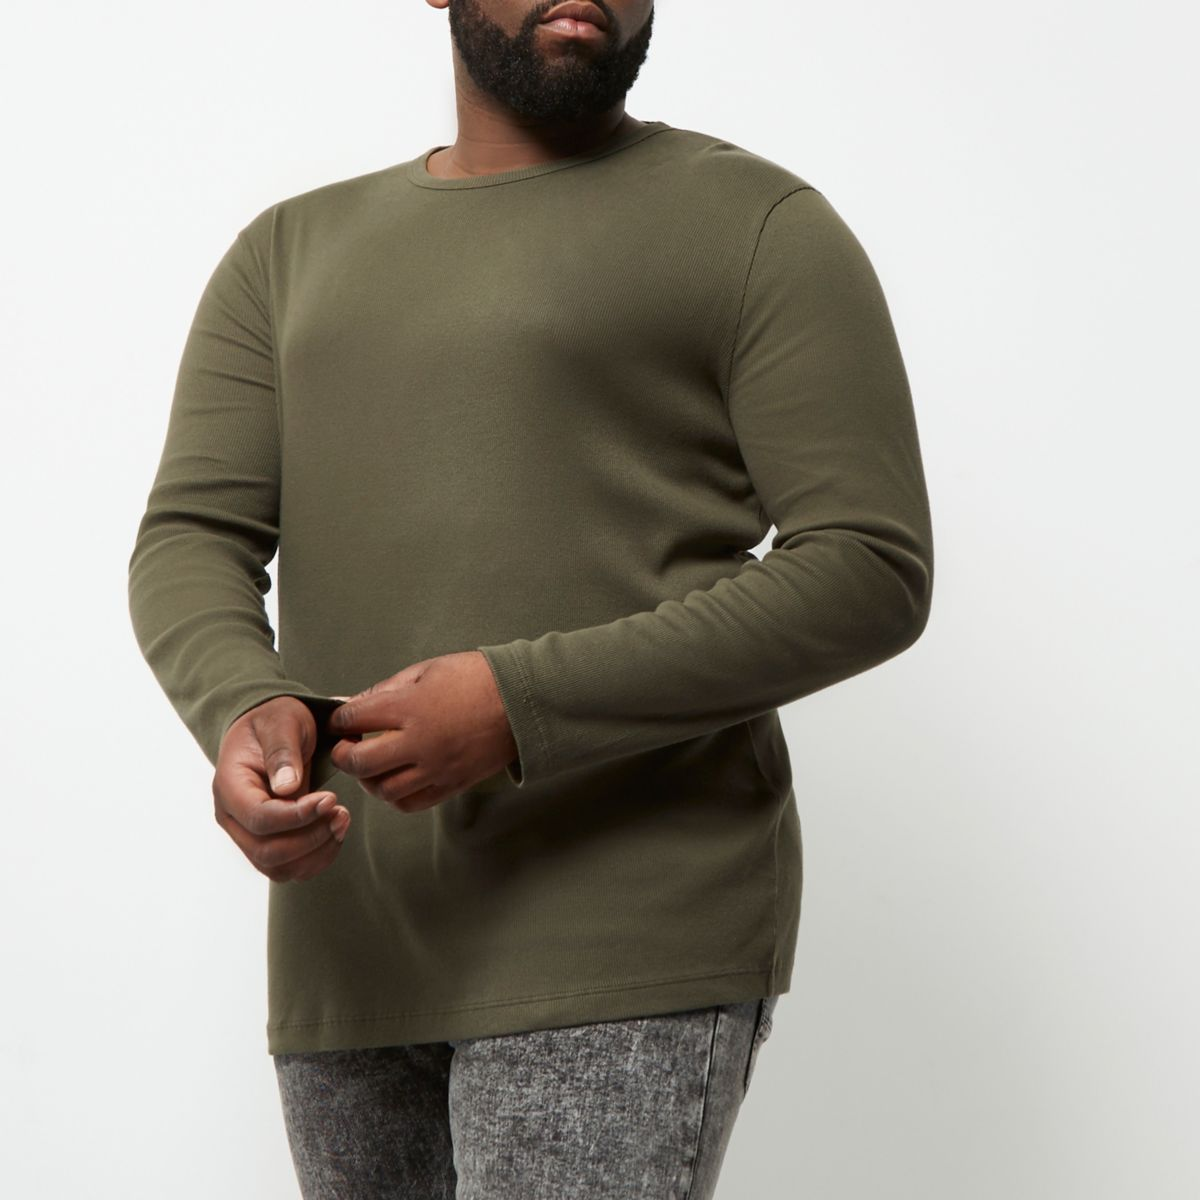 RI Big and Tall - Groen T-shirt met lange mouwen